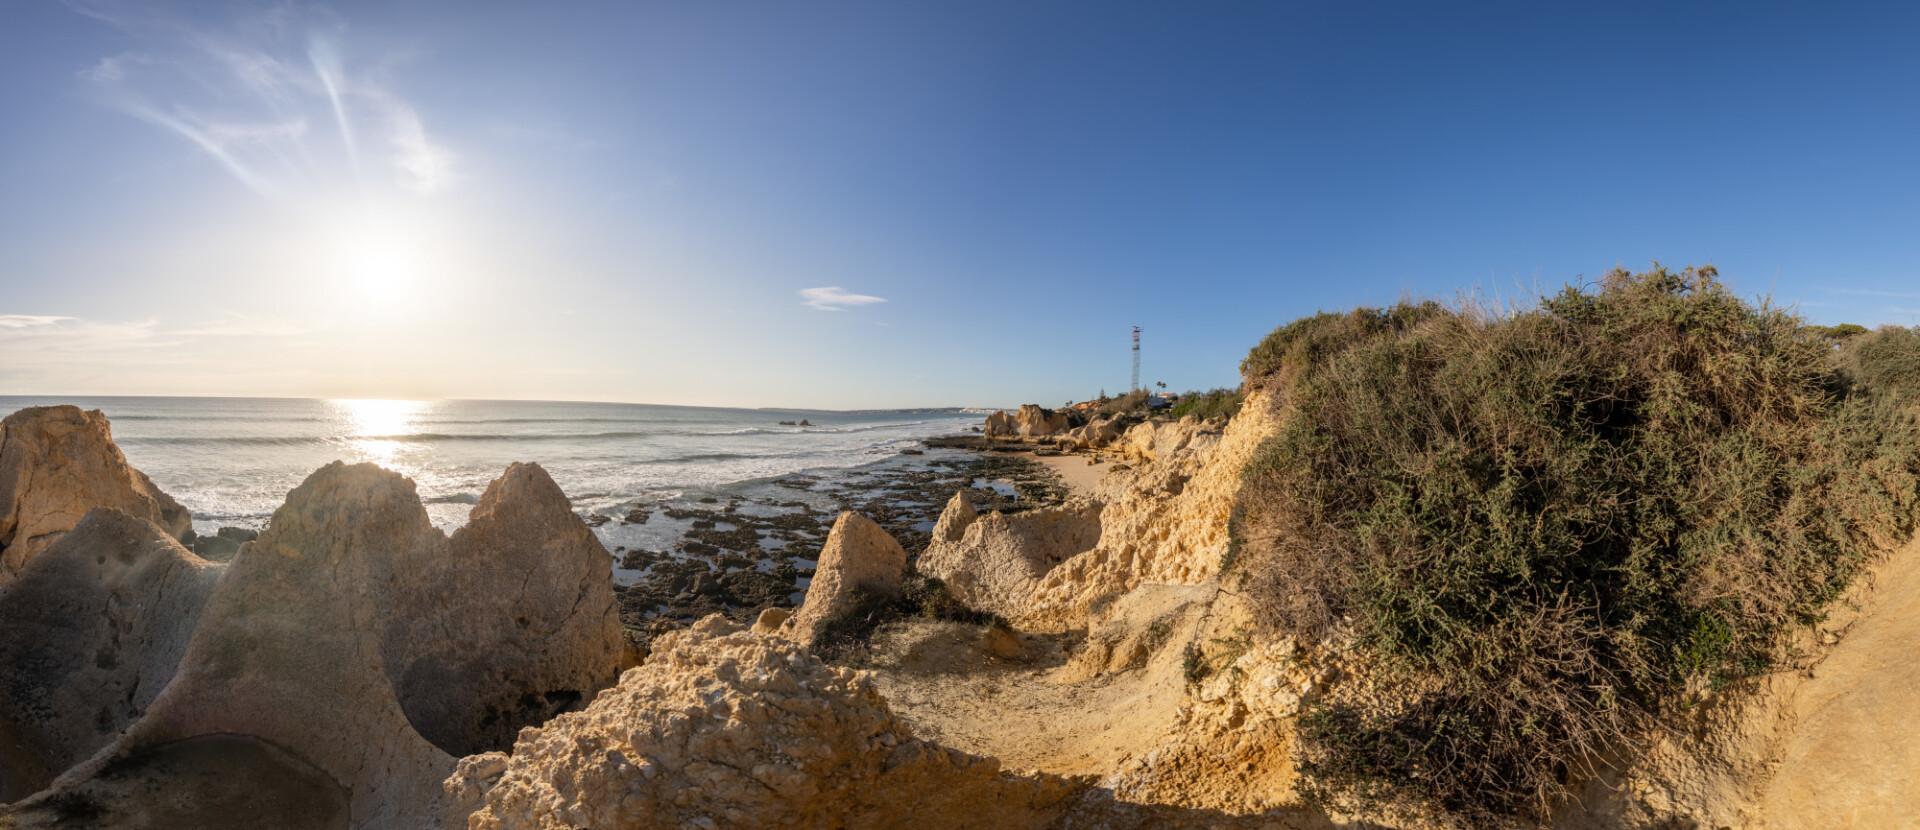 Praia de Manuel Lourenco Seascape Panorama in Portugal